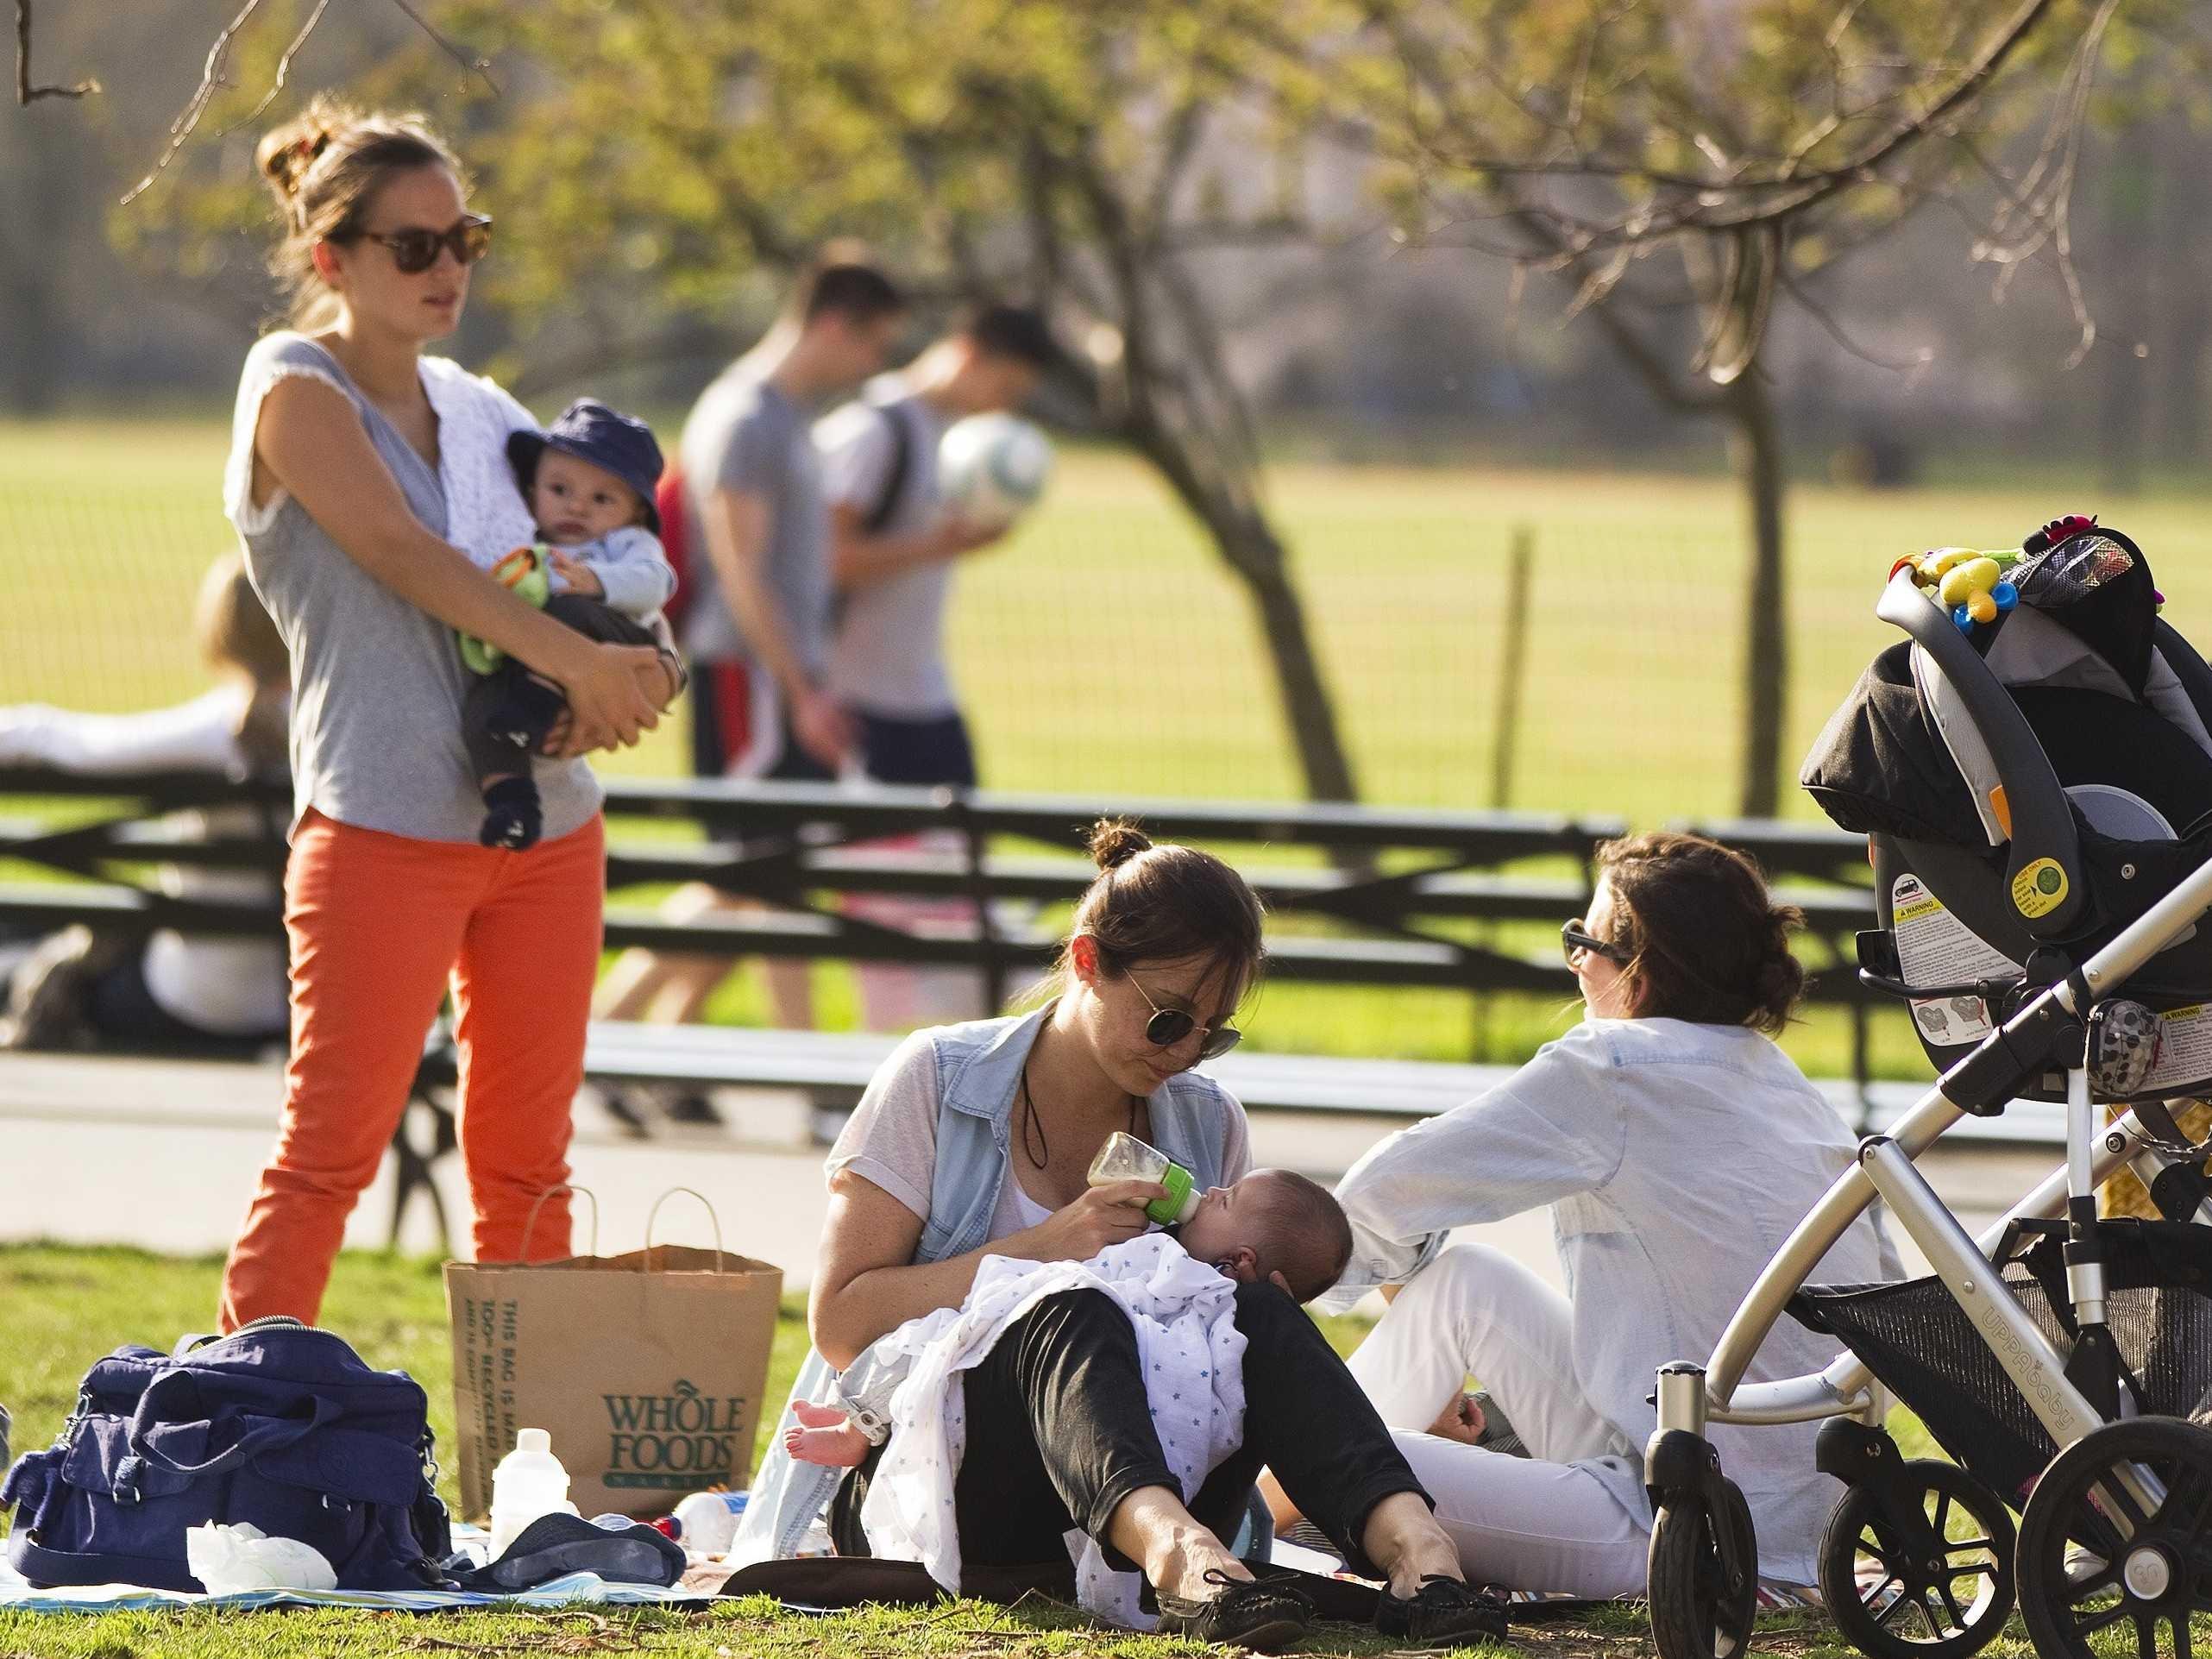 Thin white women in a park tending to children